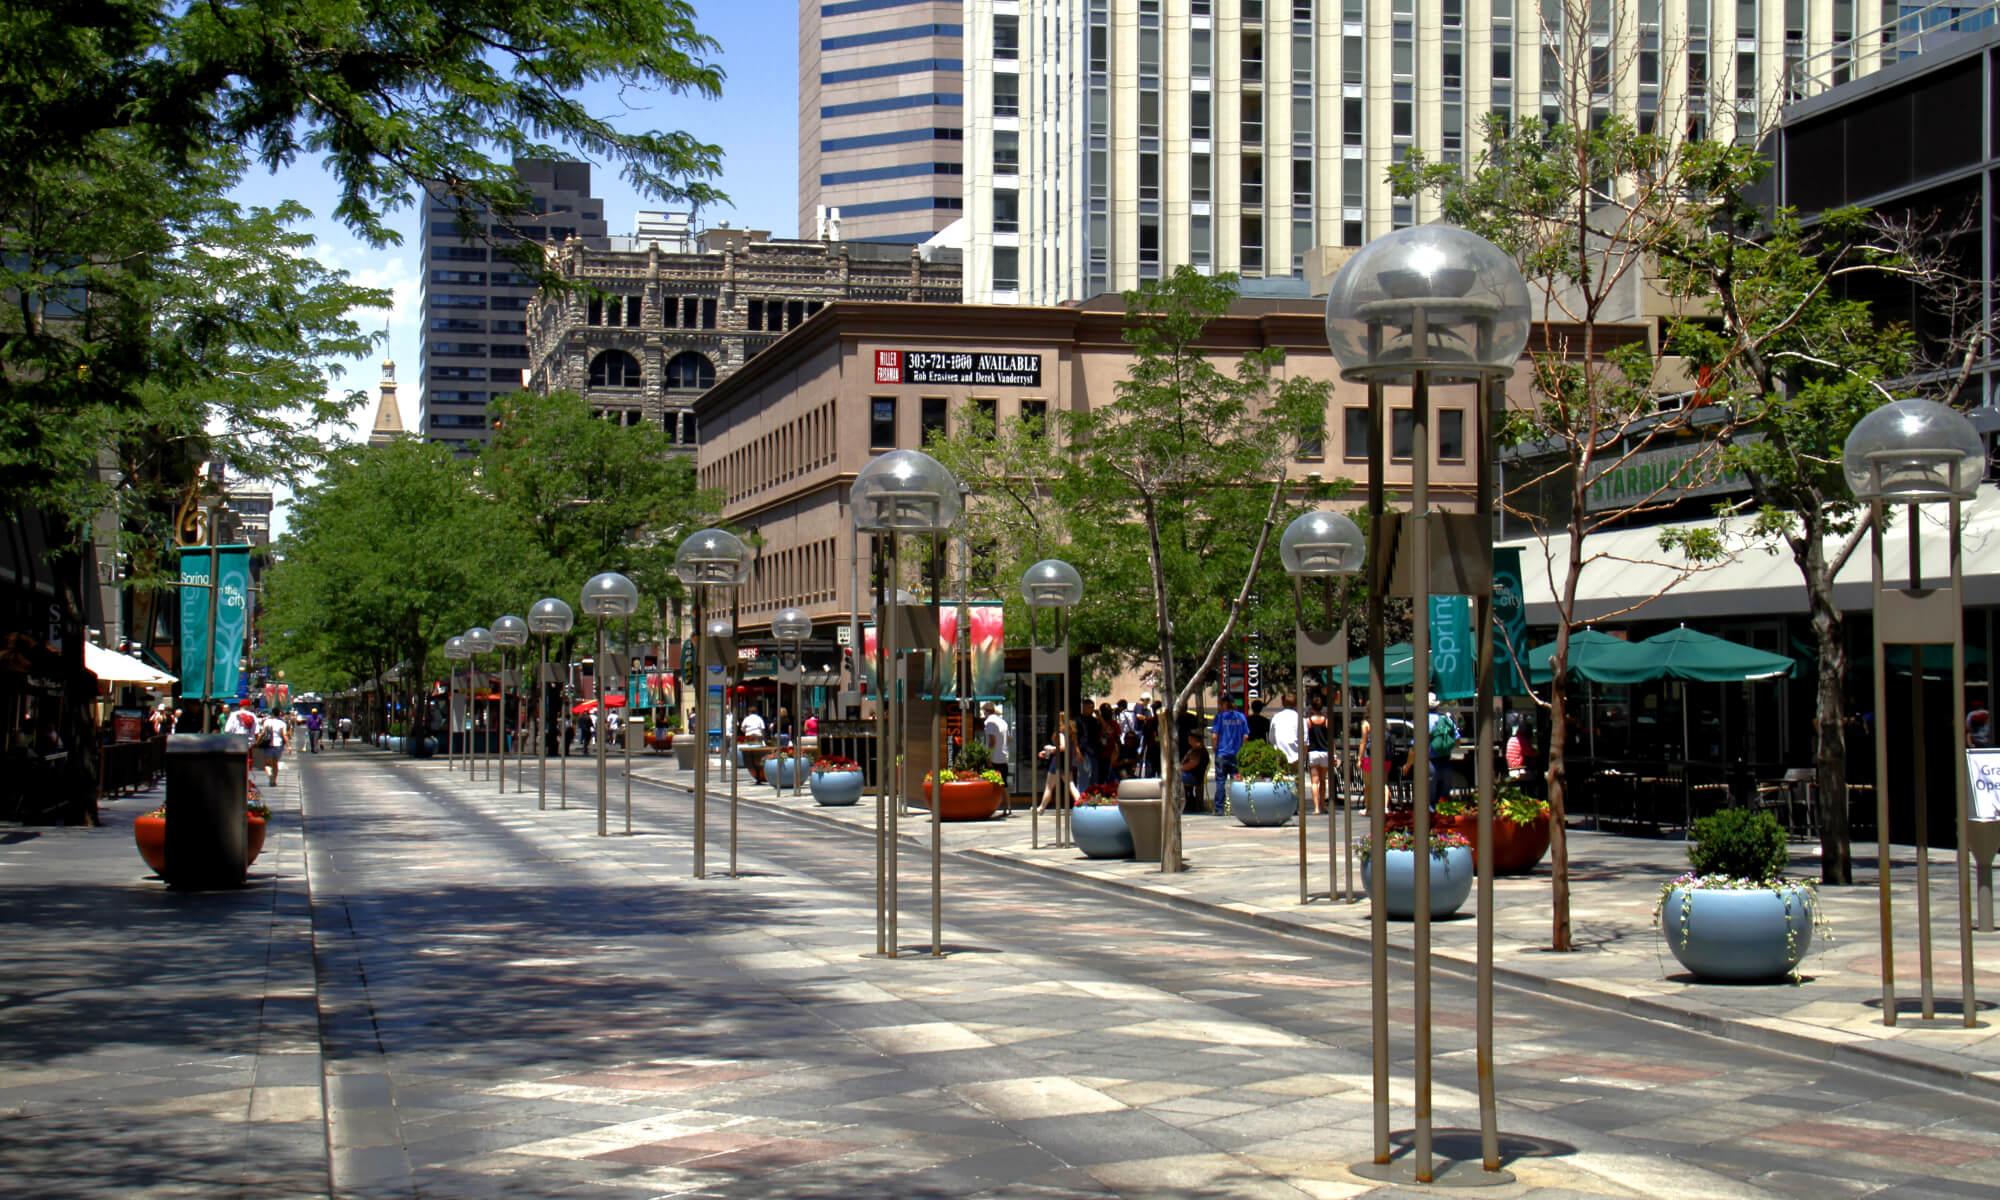 16th street mall in Denver, Colorado